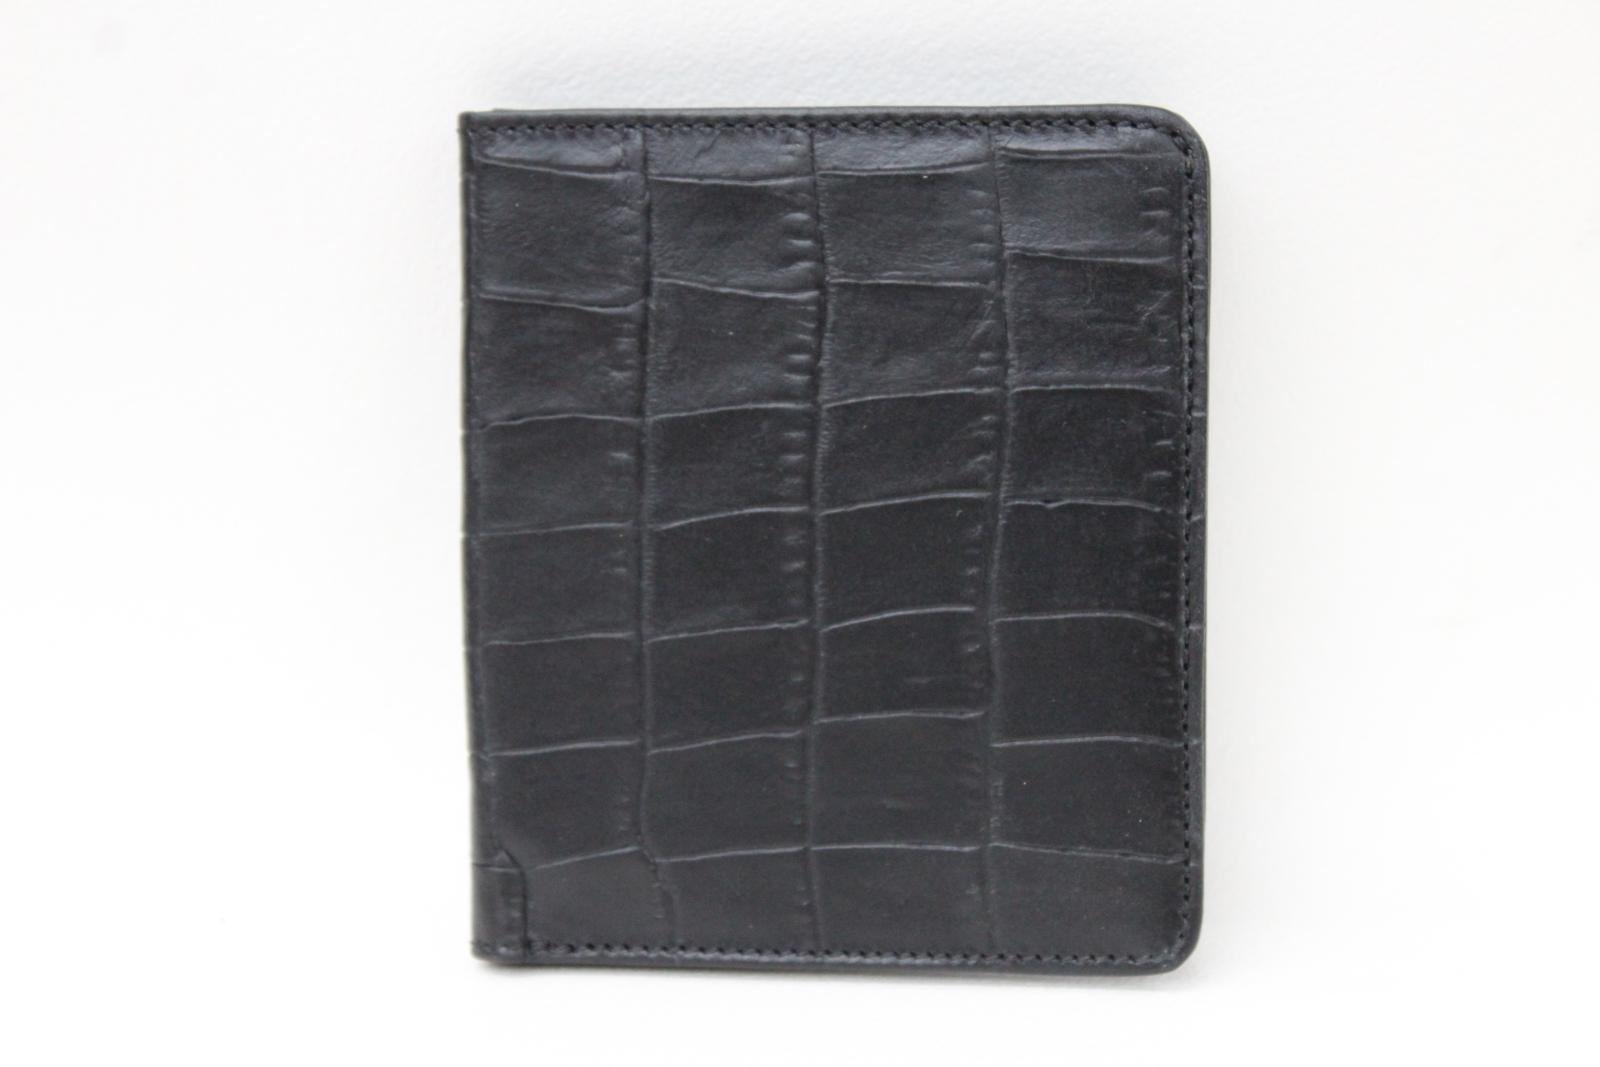 KIKI-JAMES-Men-039-s-Black-Croc-Embossed-Leather-Bifold-4-Slot-Card-amp-ID-Wallet-NEW